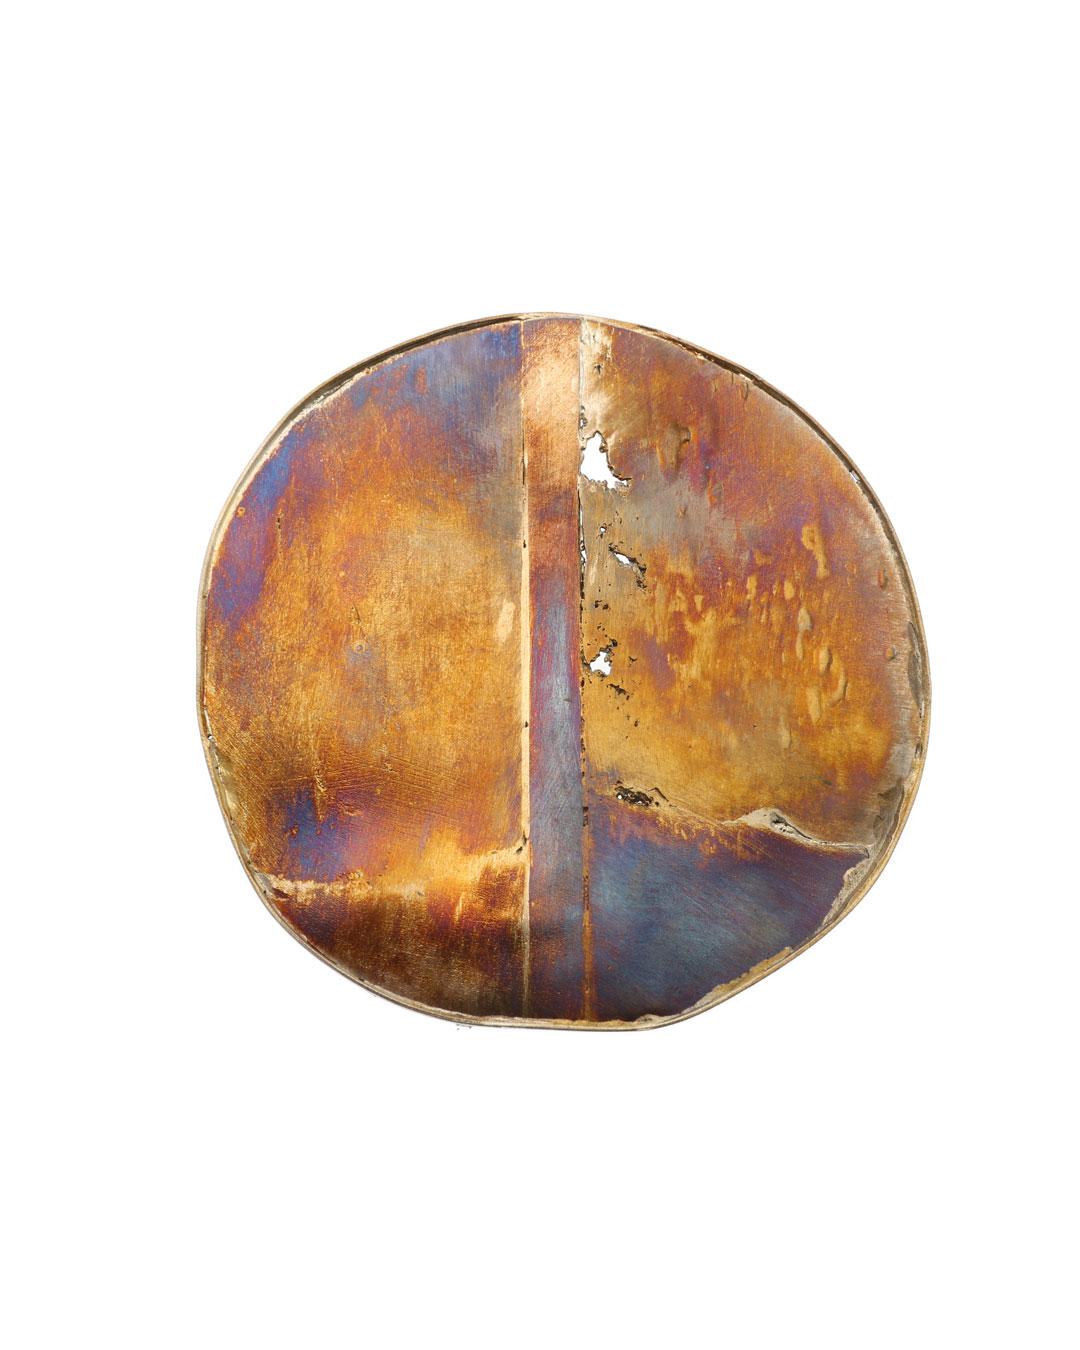 Rudolf Kocéa, Alles (Everything), 2018, brooch; silver, copper, ø 90 mm, €2150